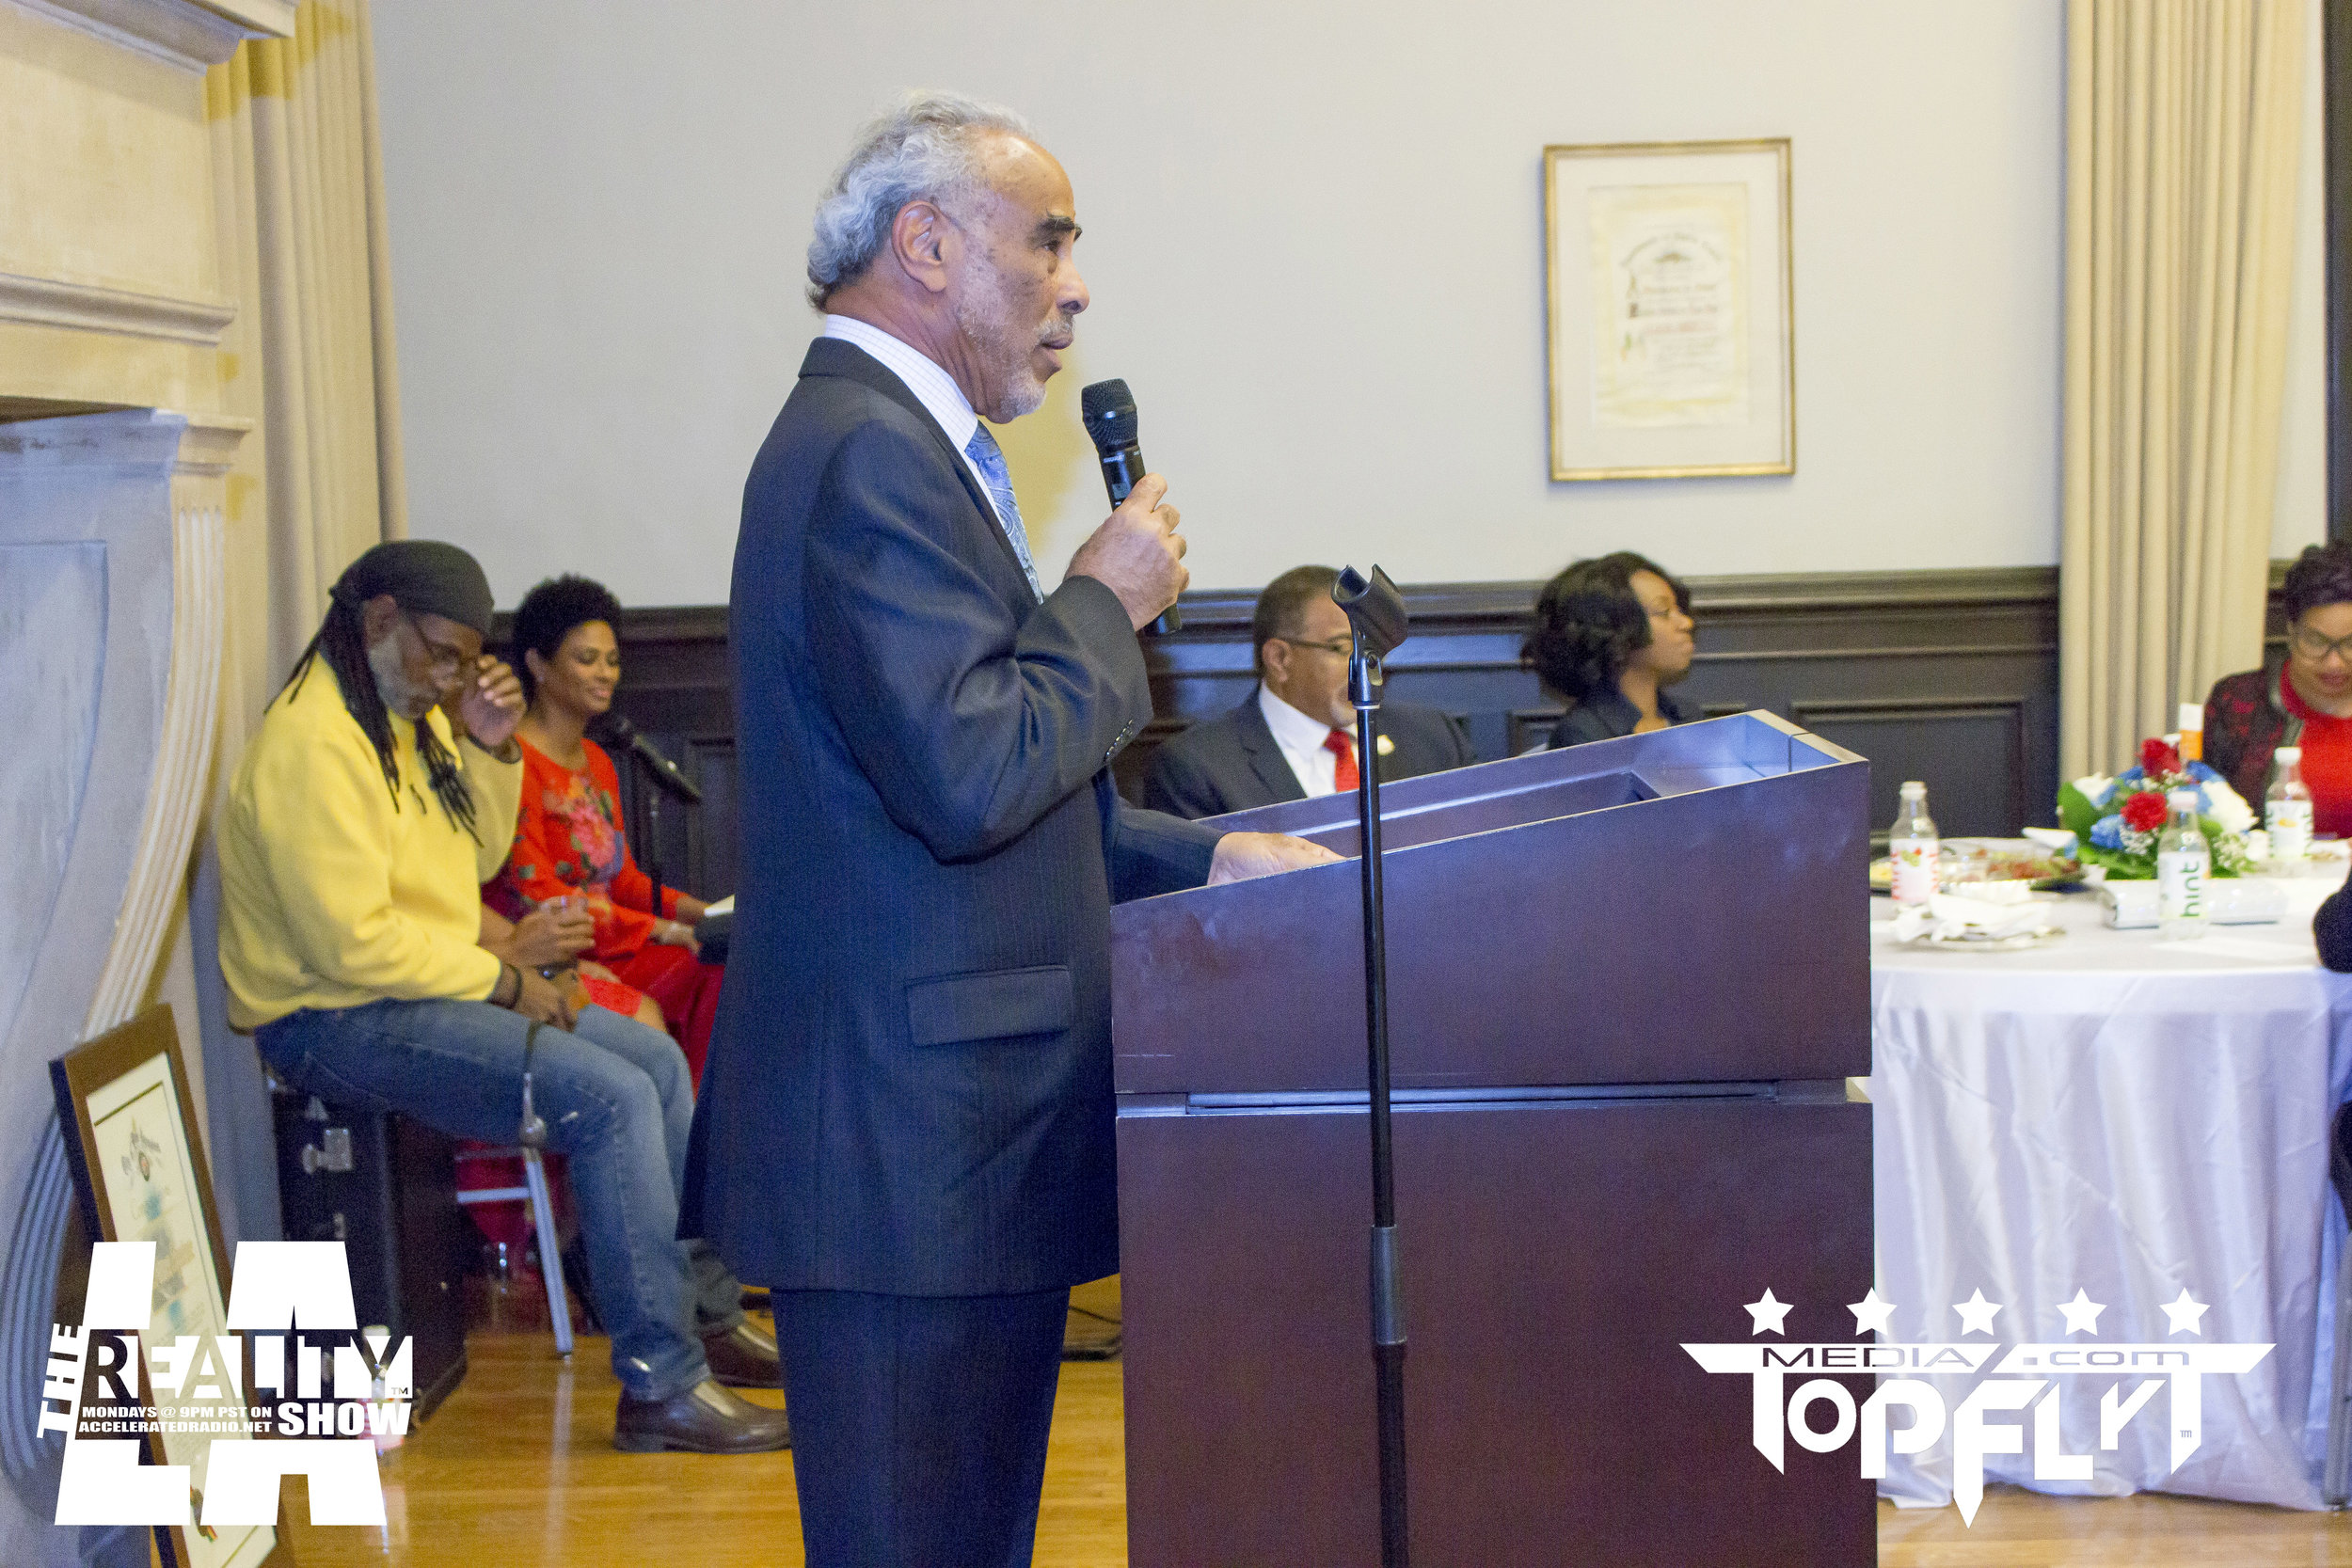 The Reality Show LA - Tuskegee Airmen 75th Anniversary VIP Reception_131.jpg